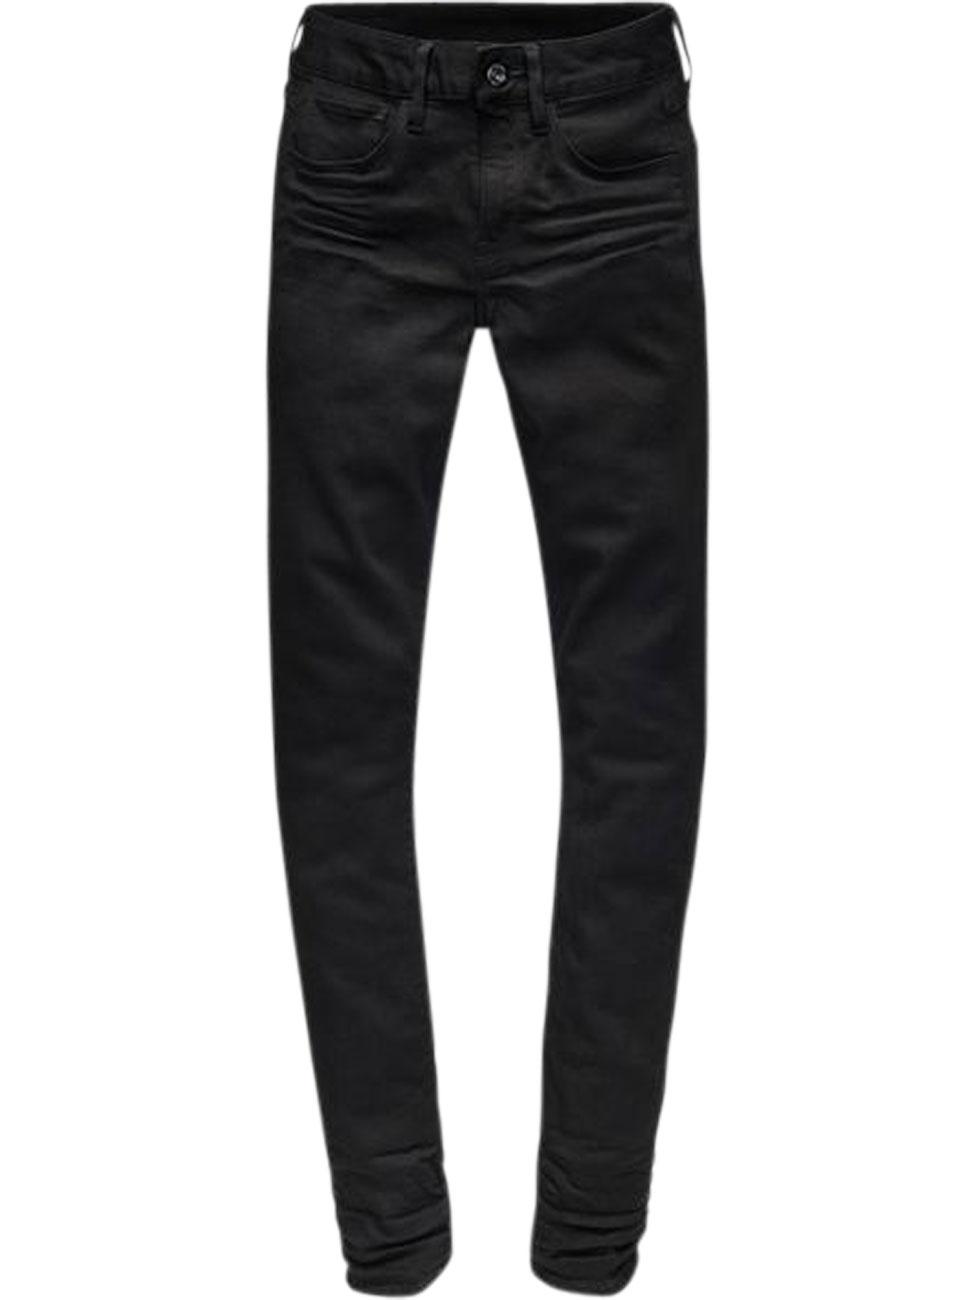 g star damen jeans 3301 deconstructed mid waist straight. Black Bedroom Furniture Sets. Home Design Ideas